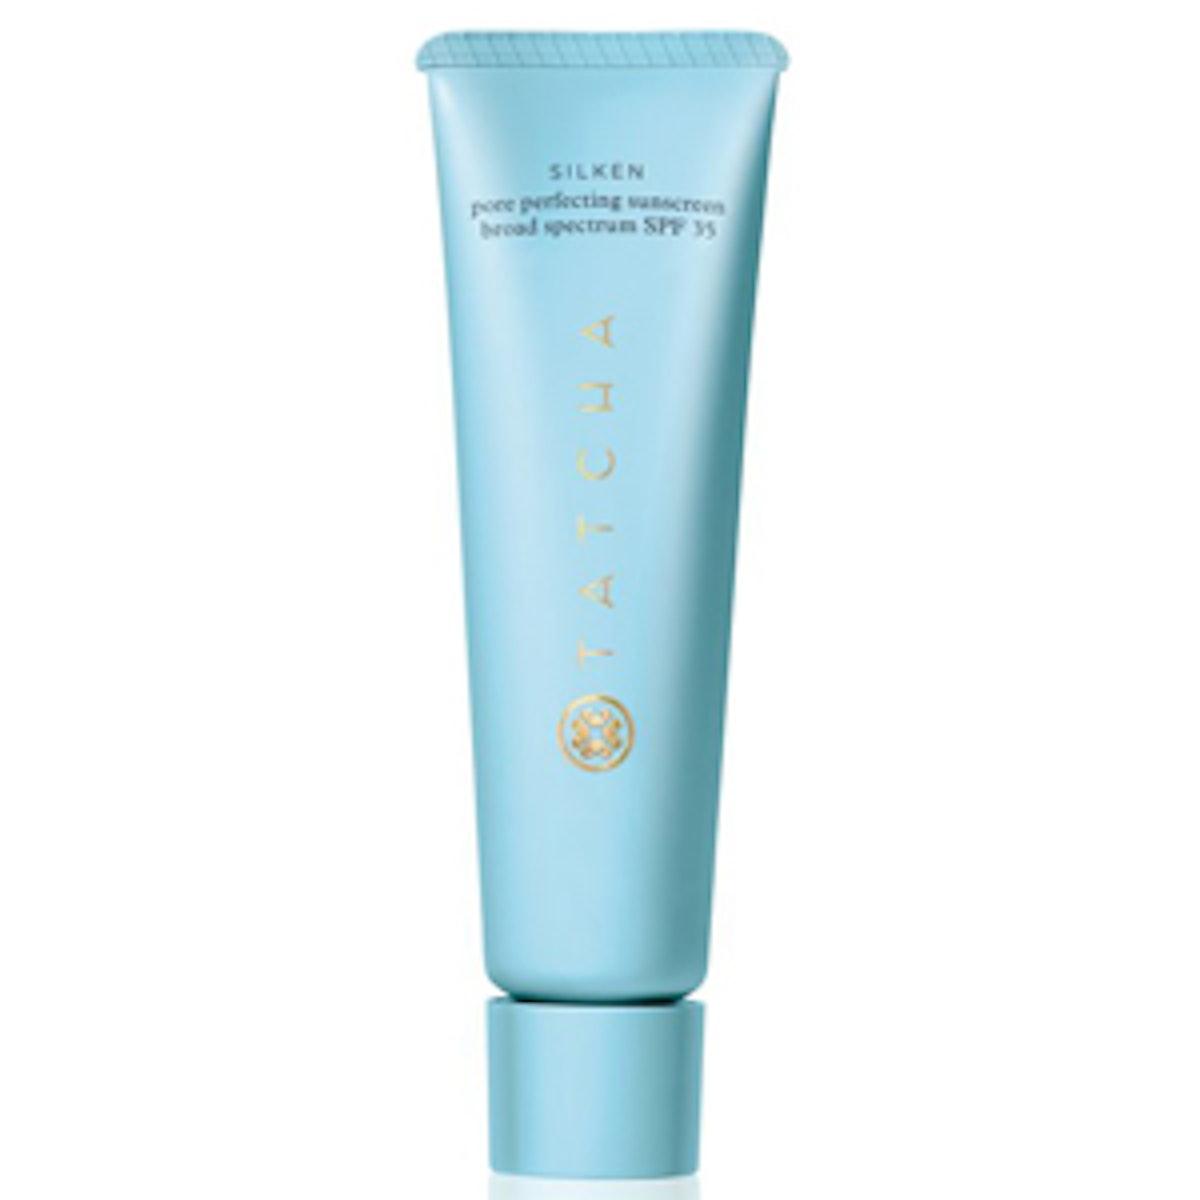 Pore Perfecting Sunscreen SPF 35